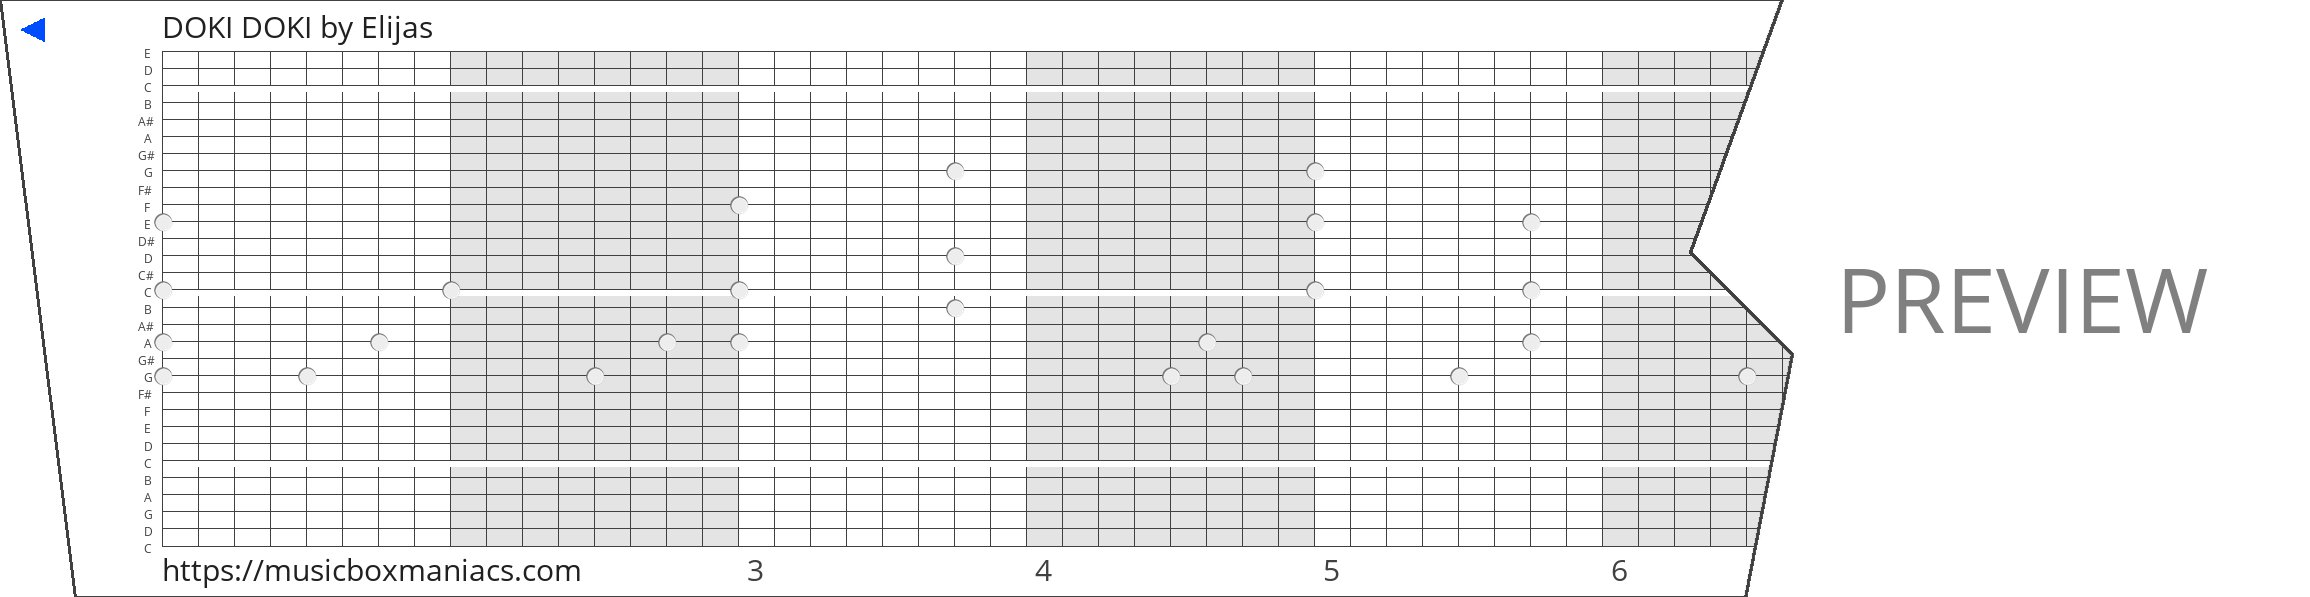 DOKI DOKI 30 note music box paper strip